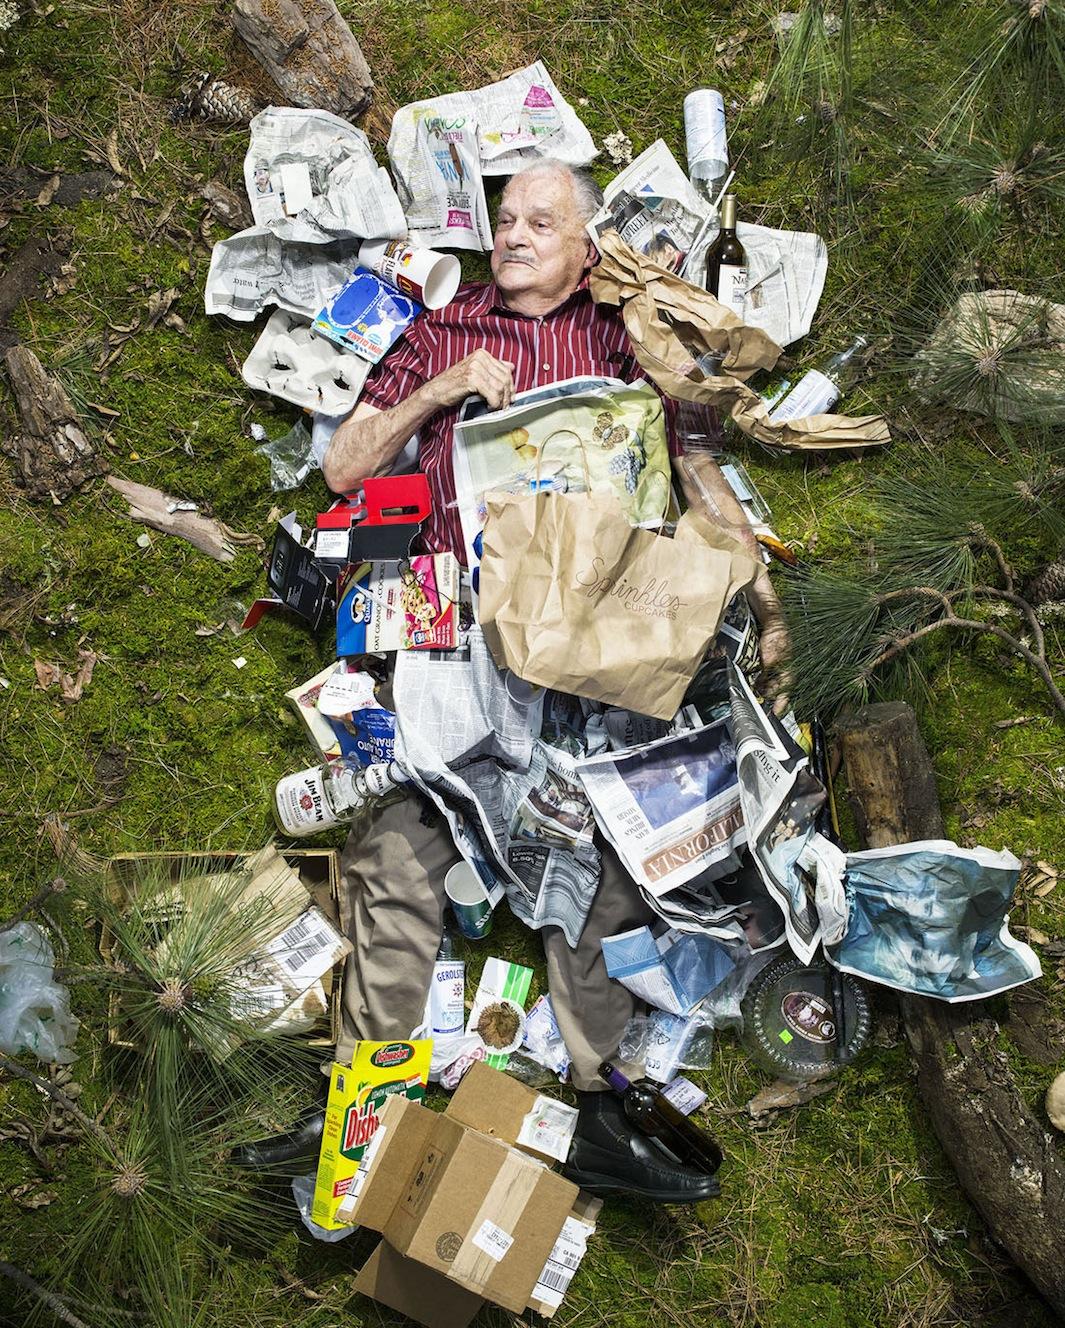 ©Gregg Segal - 7 Days of Garbage. Fotografía | Photography